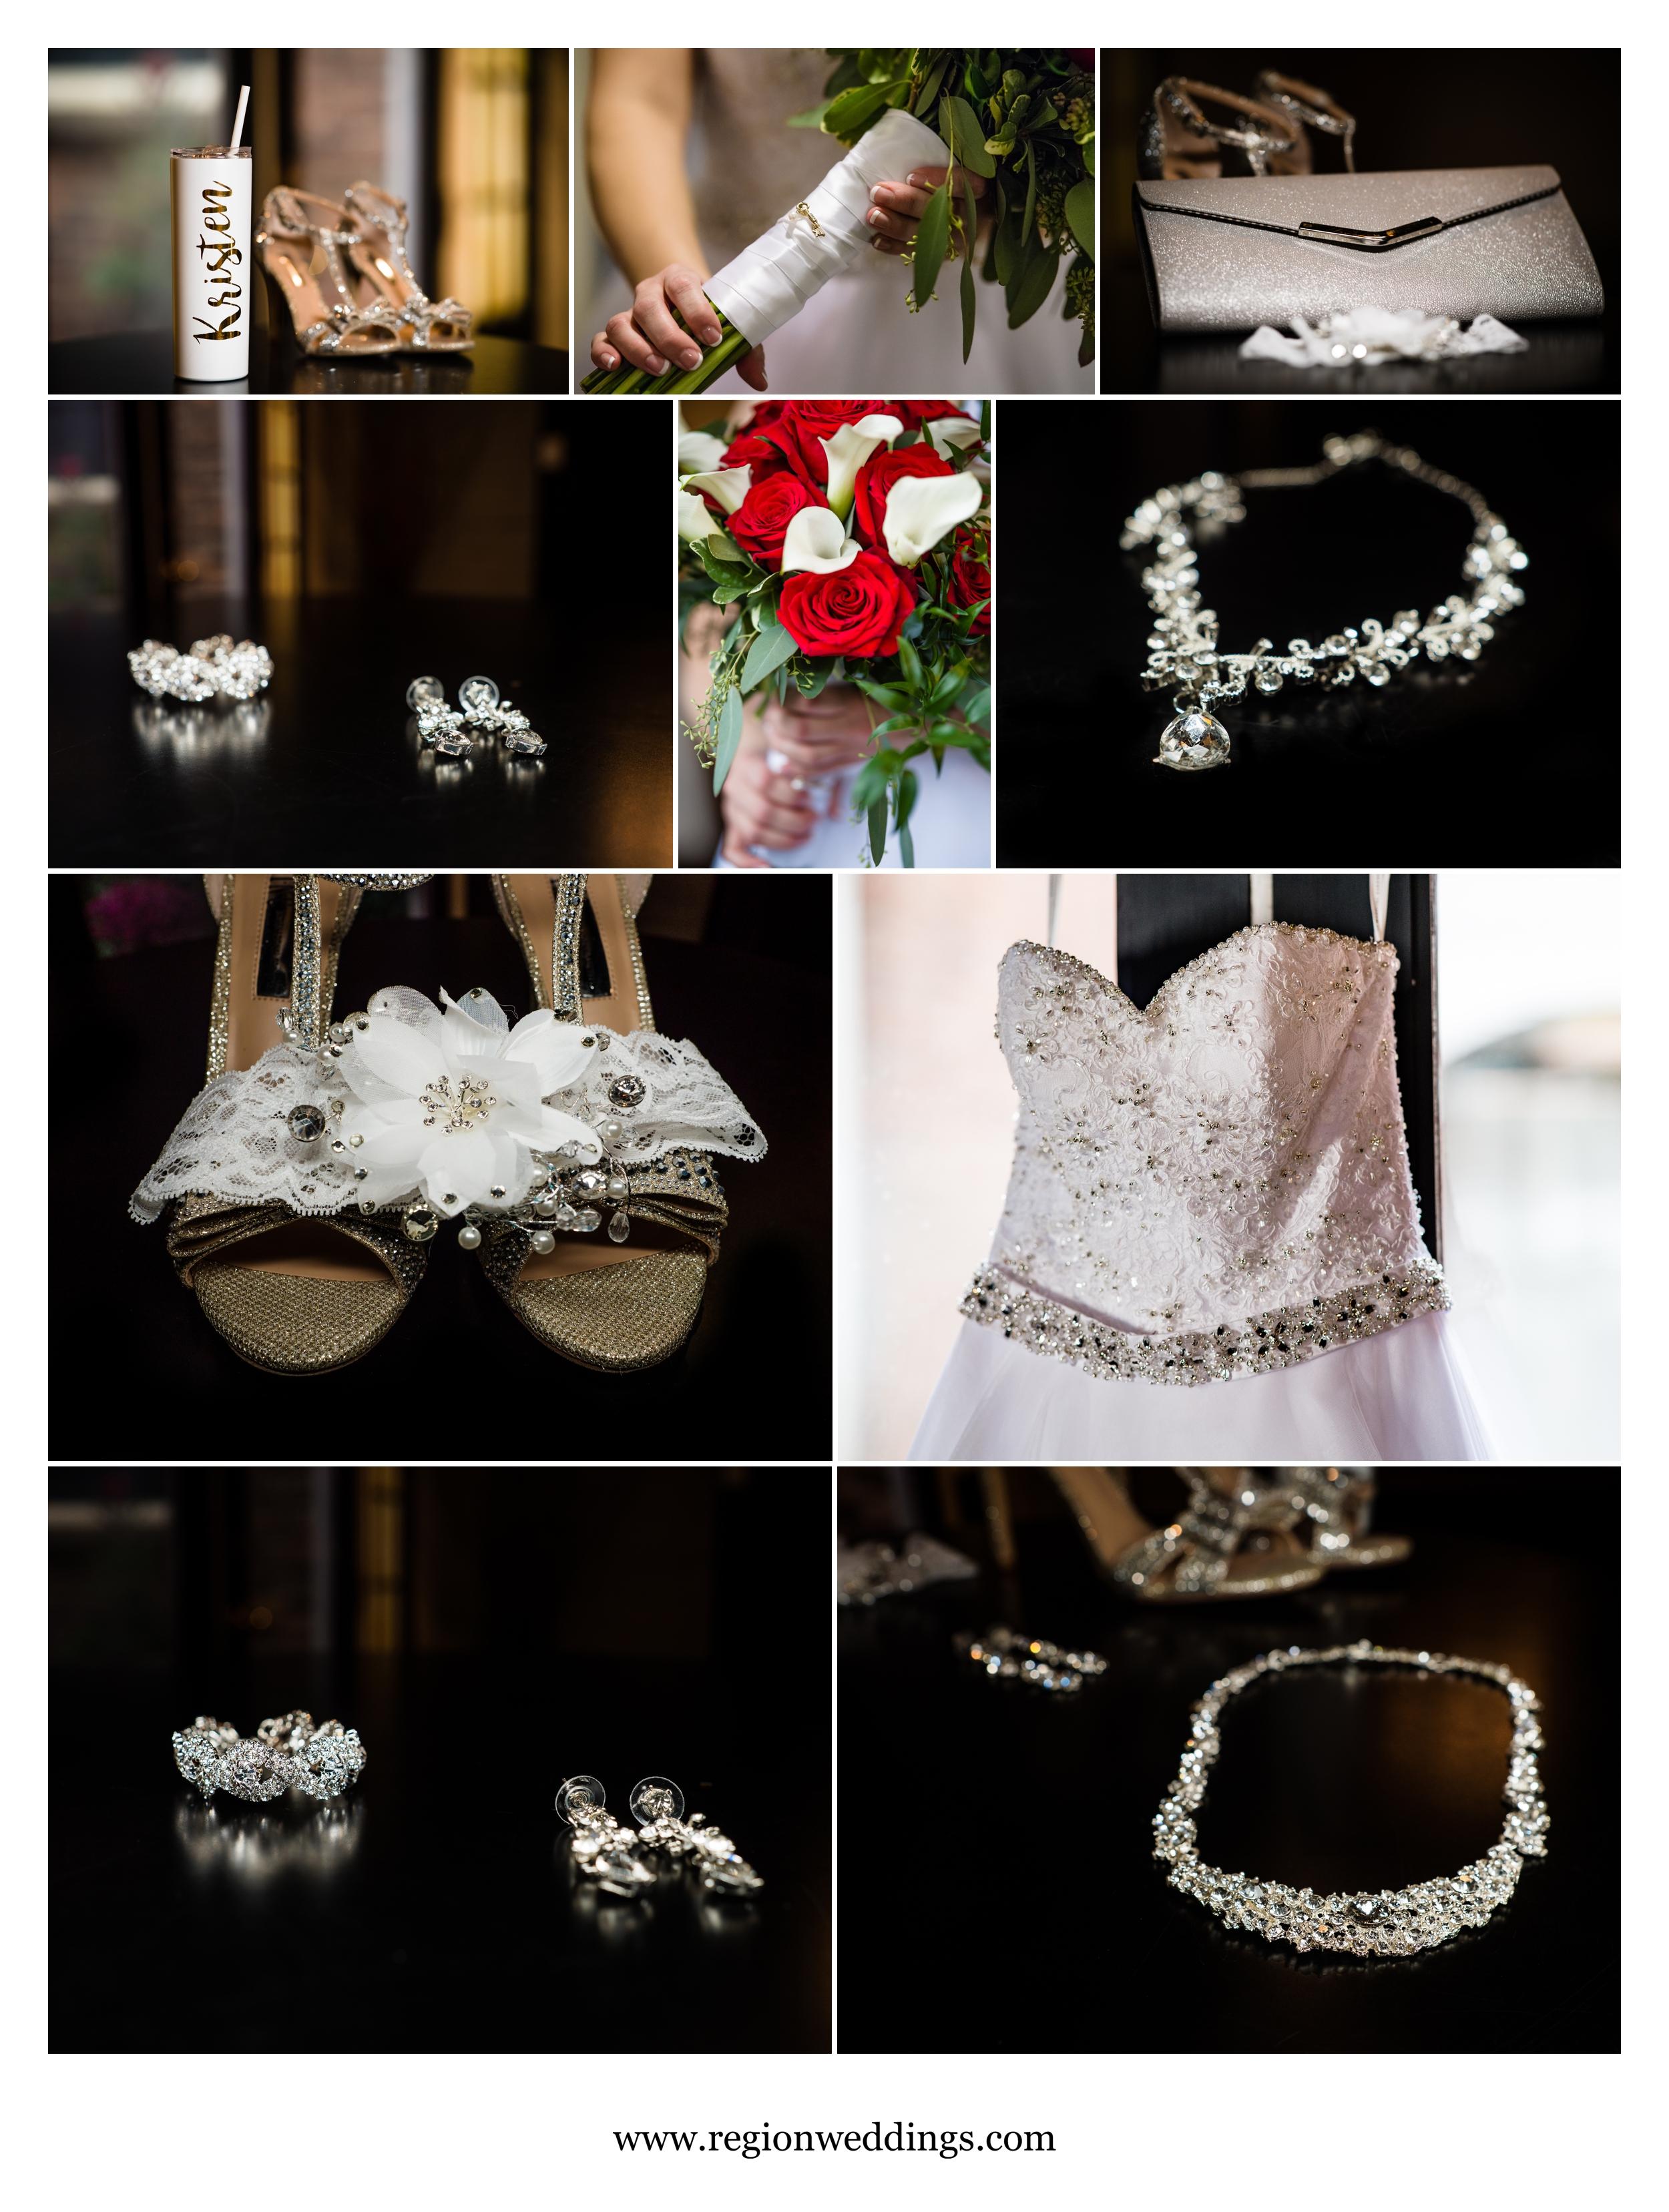 Bridal details at Uptown Center.